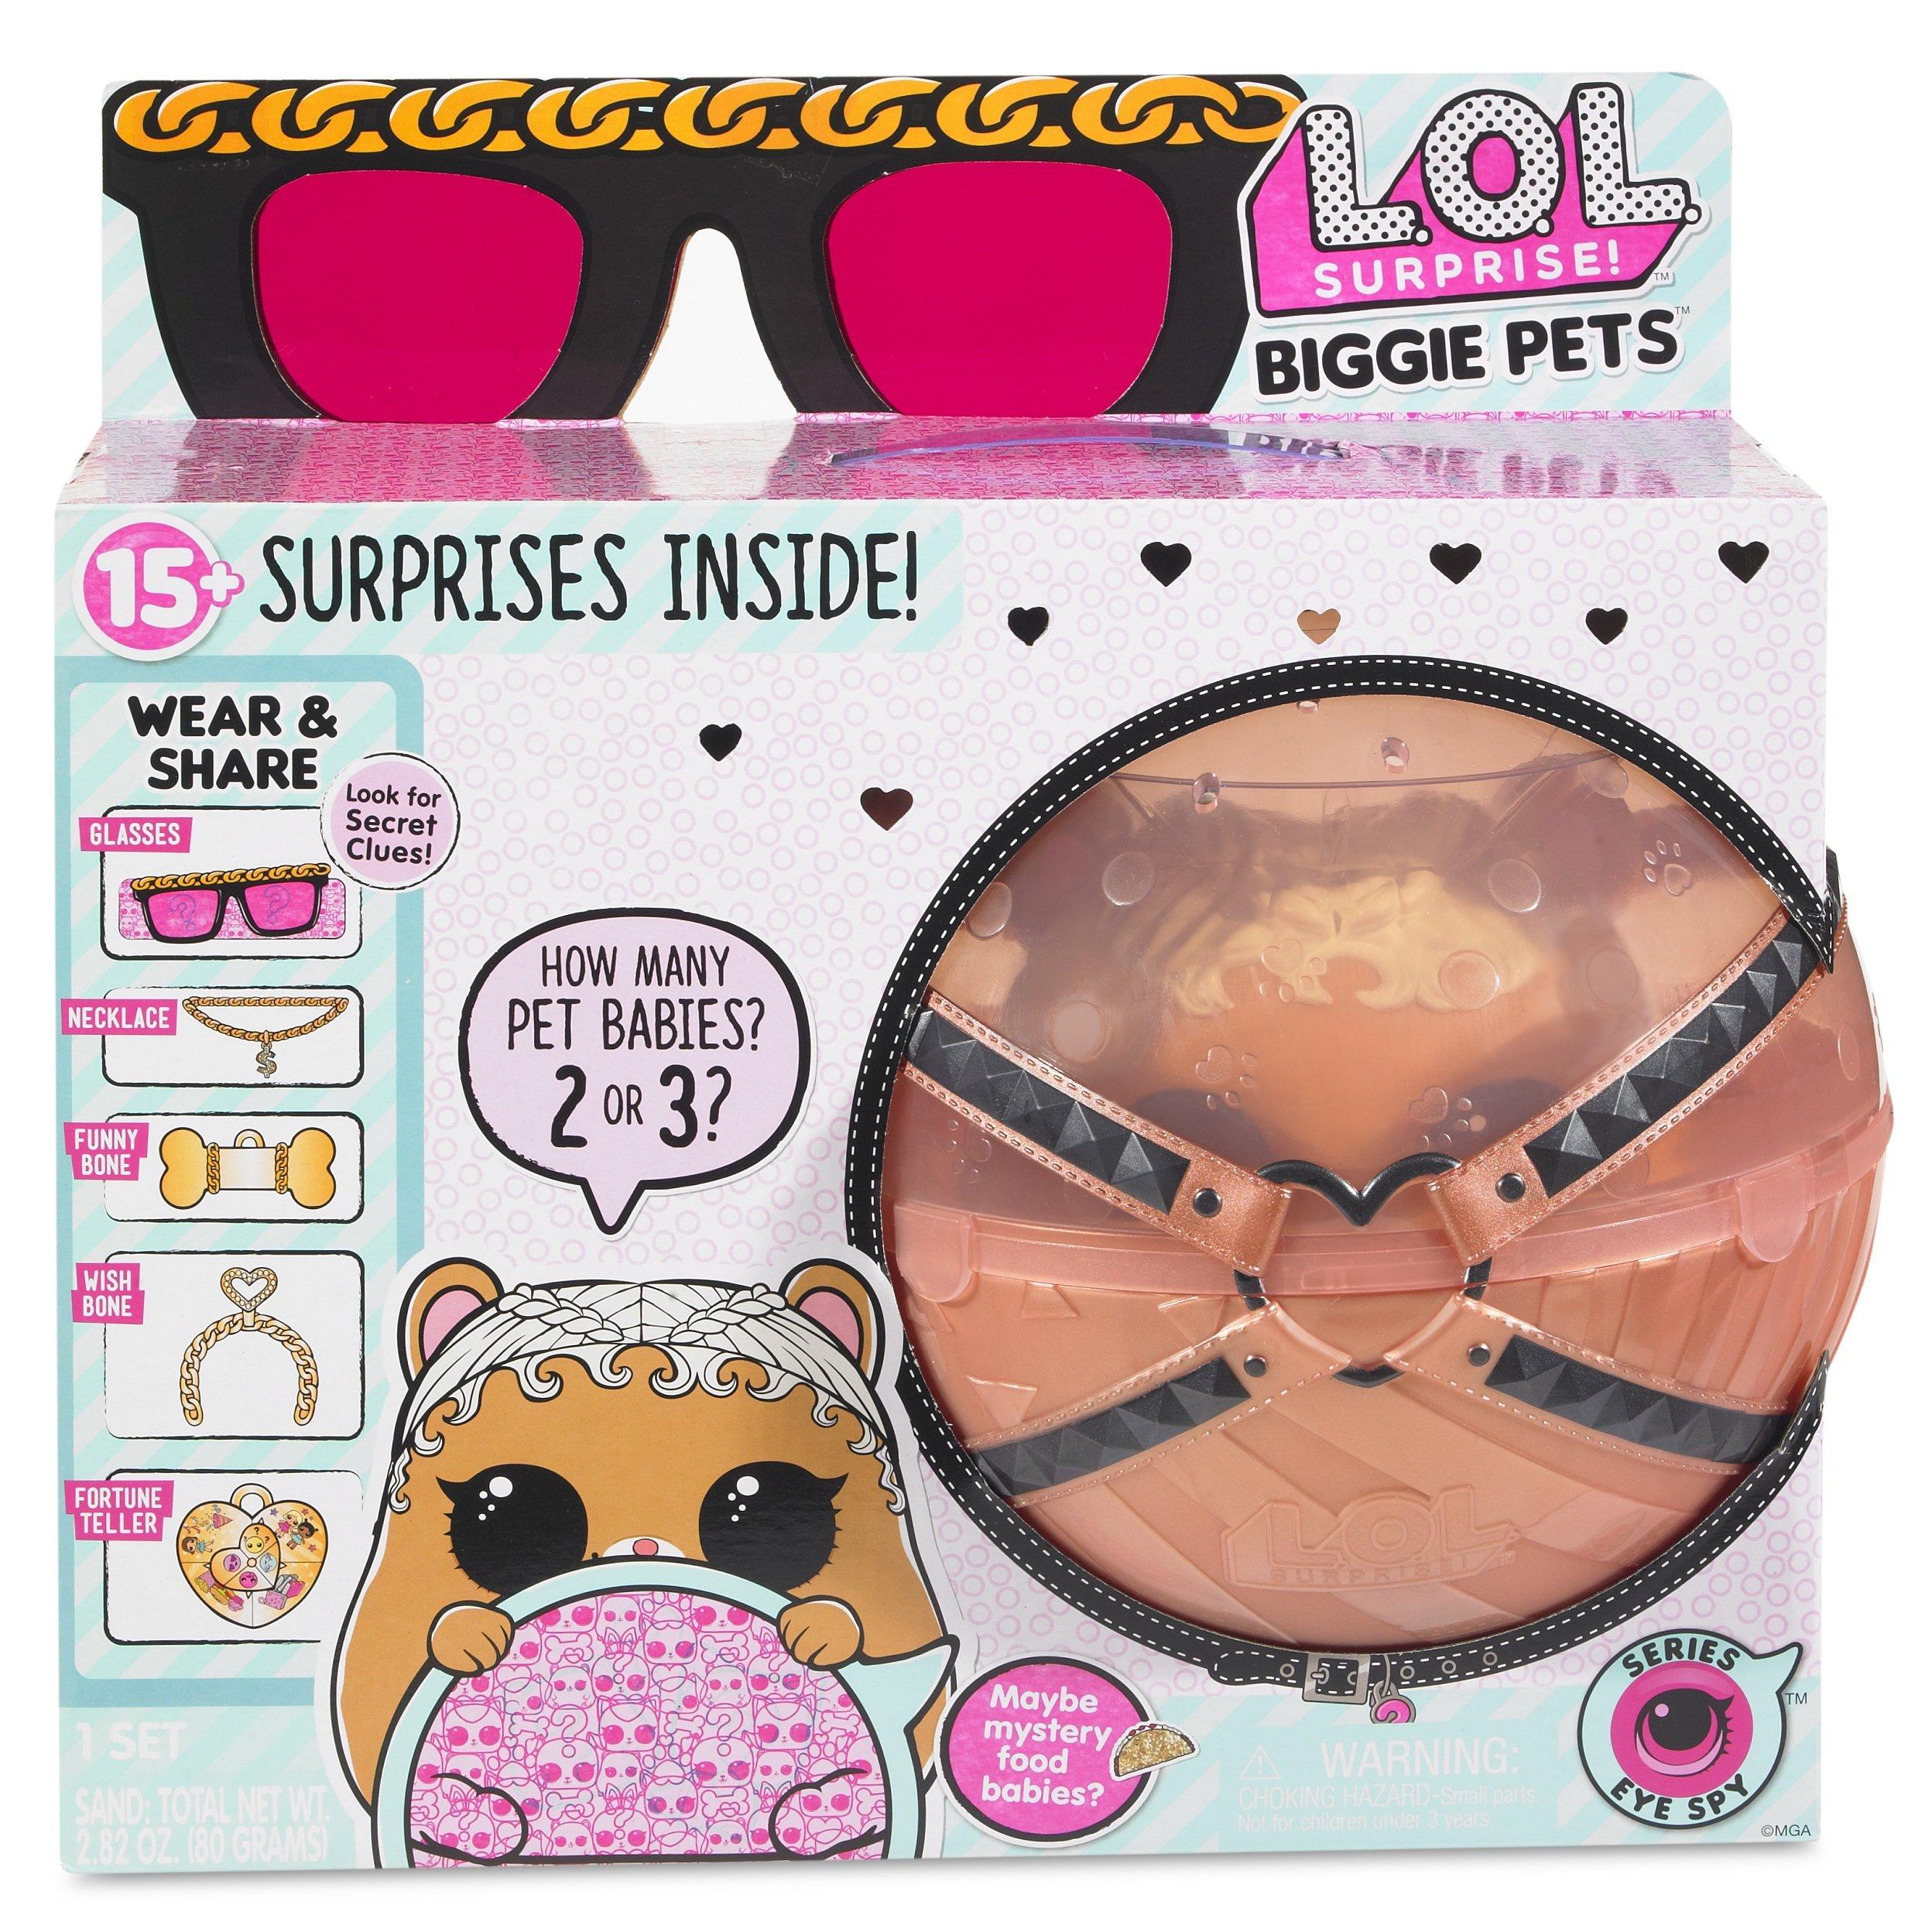 L.O.L. Surprise! Biggie Pet MC Hammy